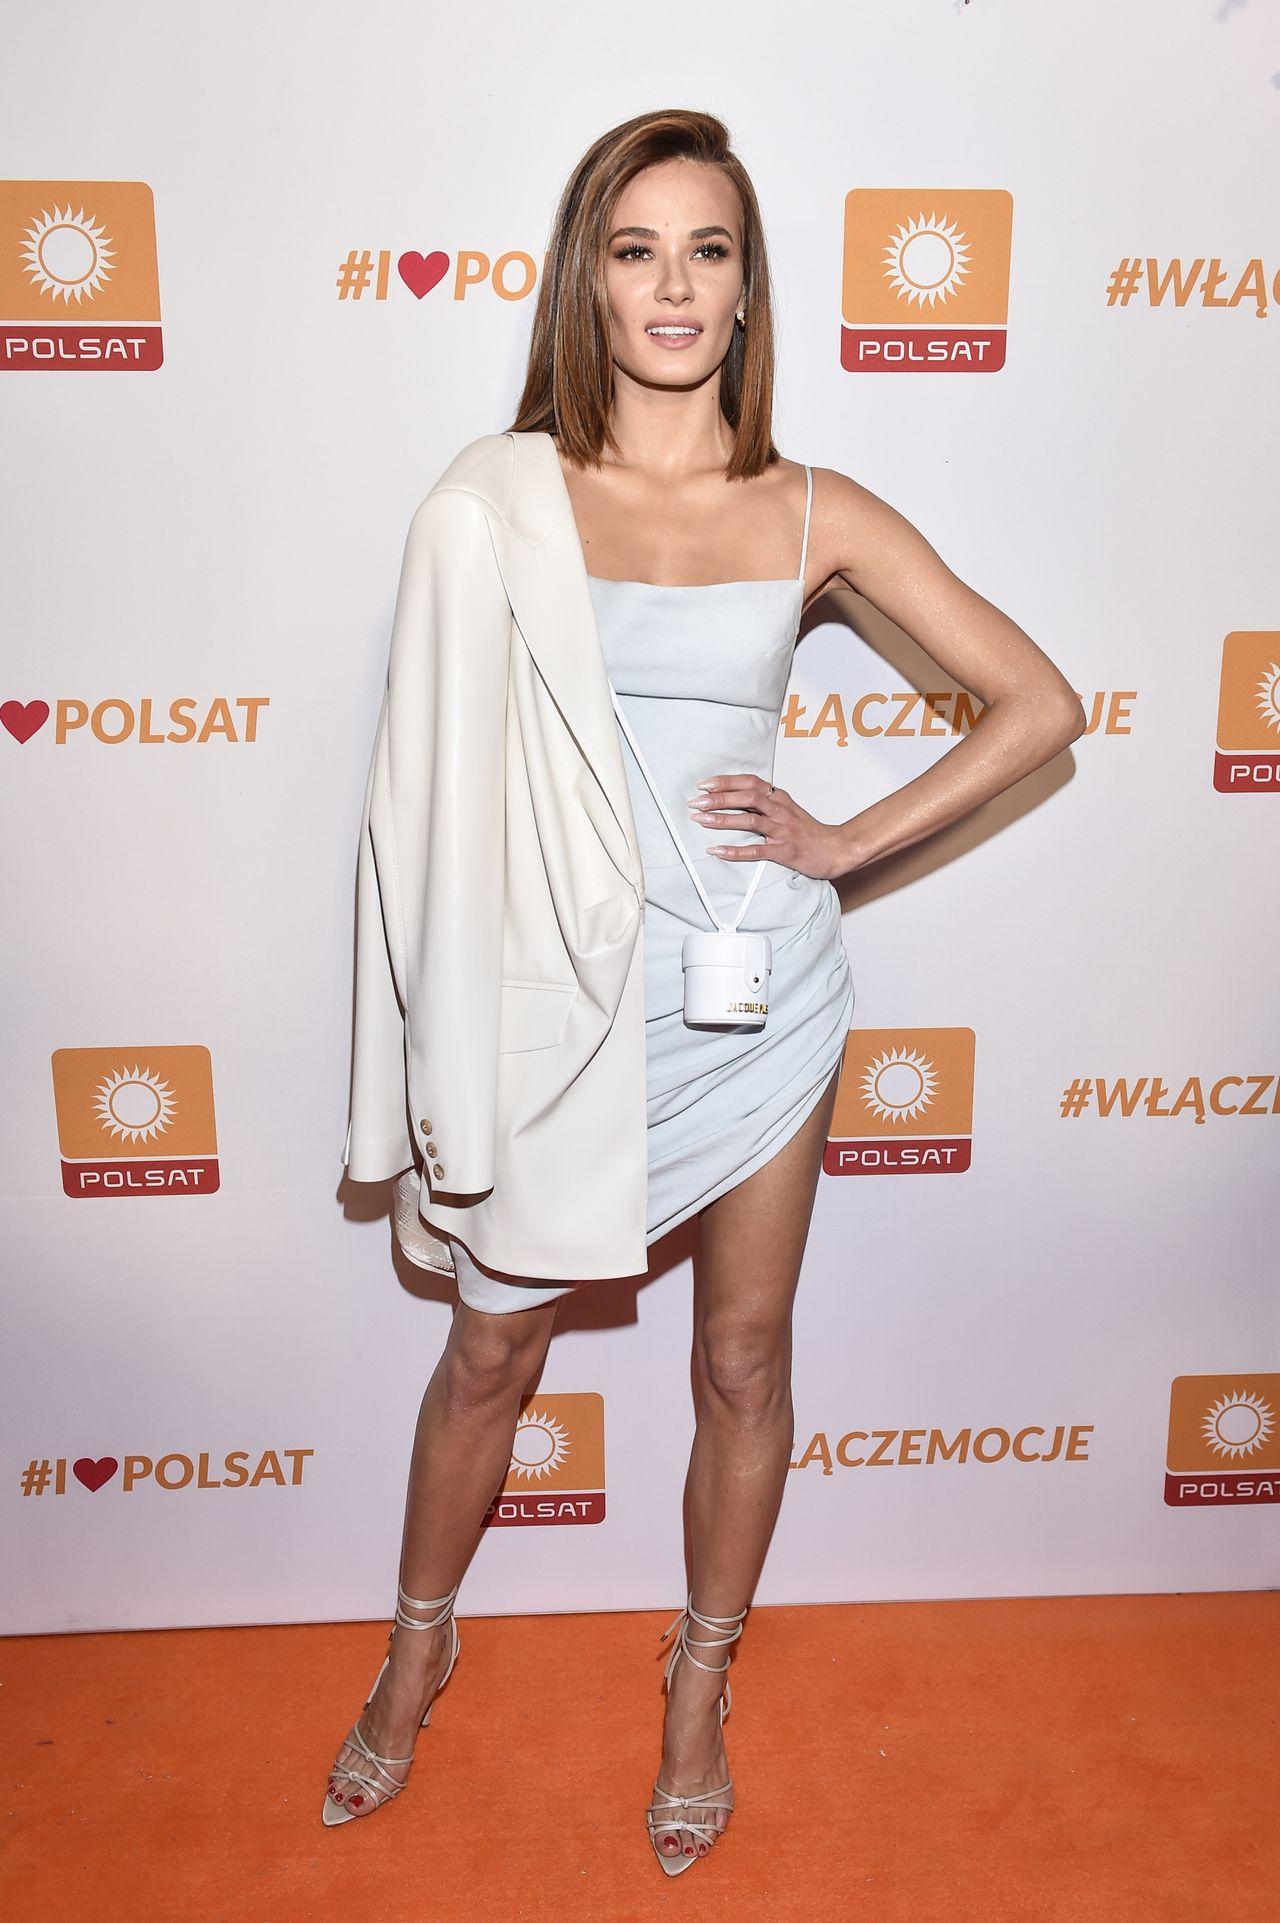 Natalia Szroeder na imprezie Polsatu